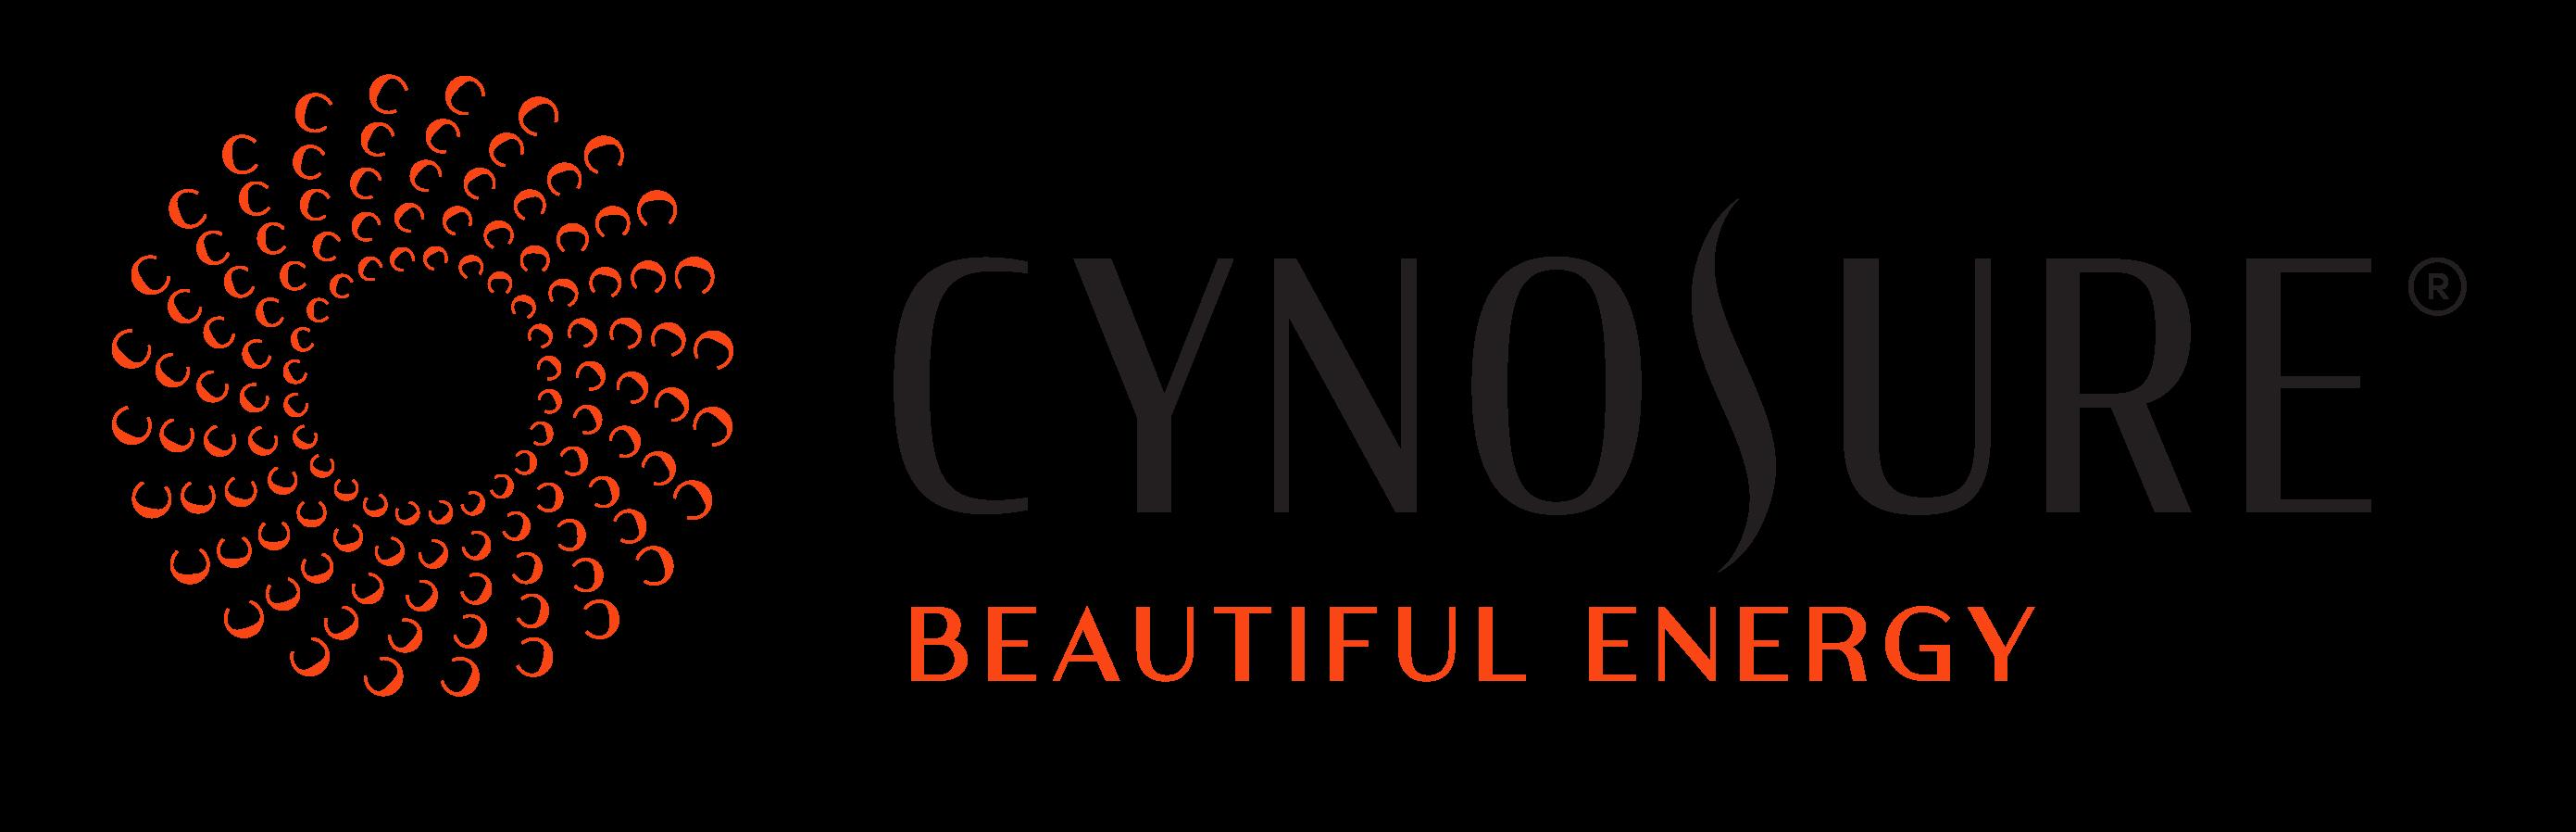 Cynosure : Brand Short Description Type Here.